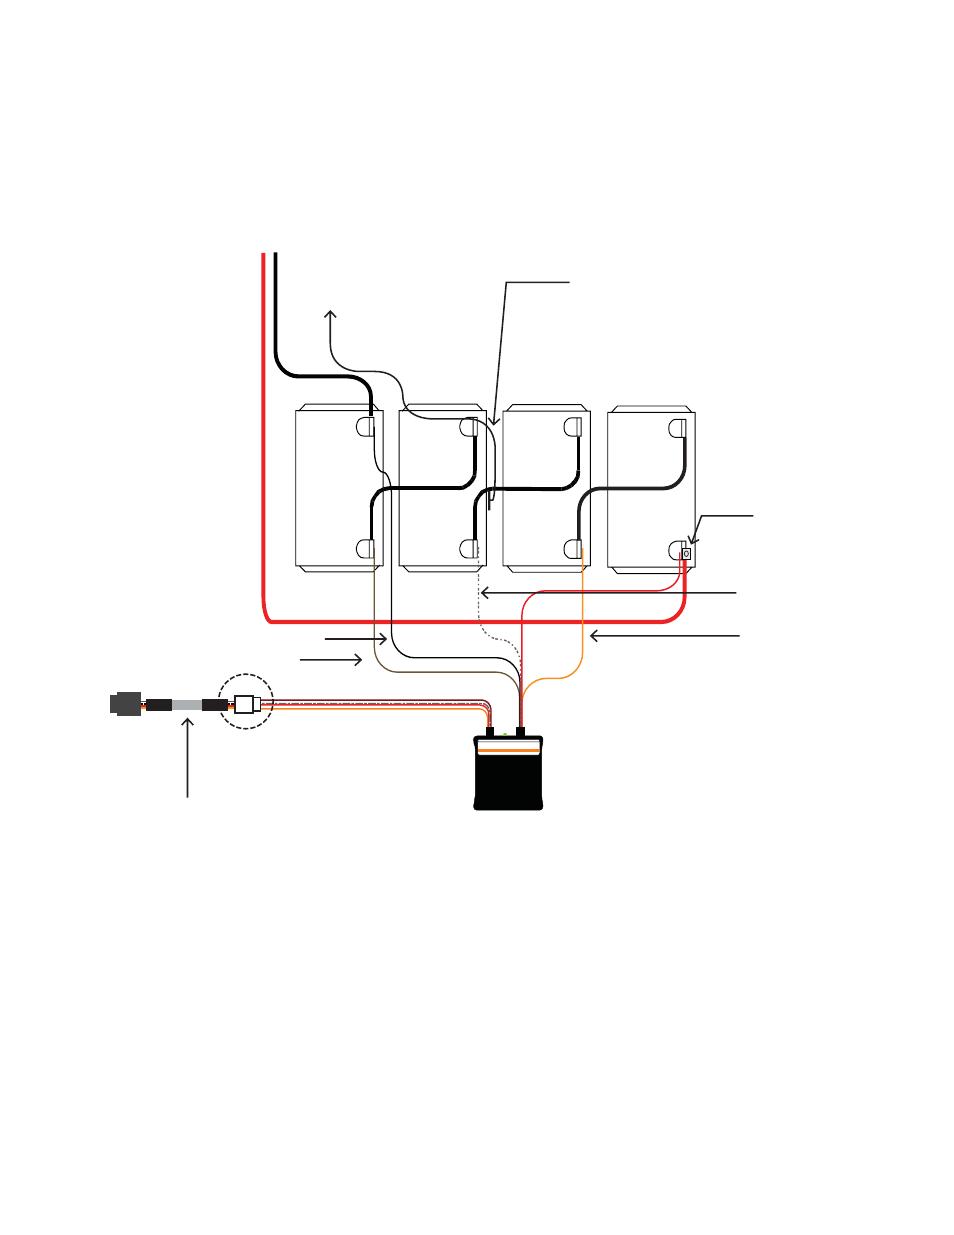 Installation Alpha Technologies Underground Battery Vault User Wiring Diagram Manual Page 16 24